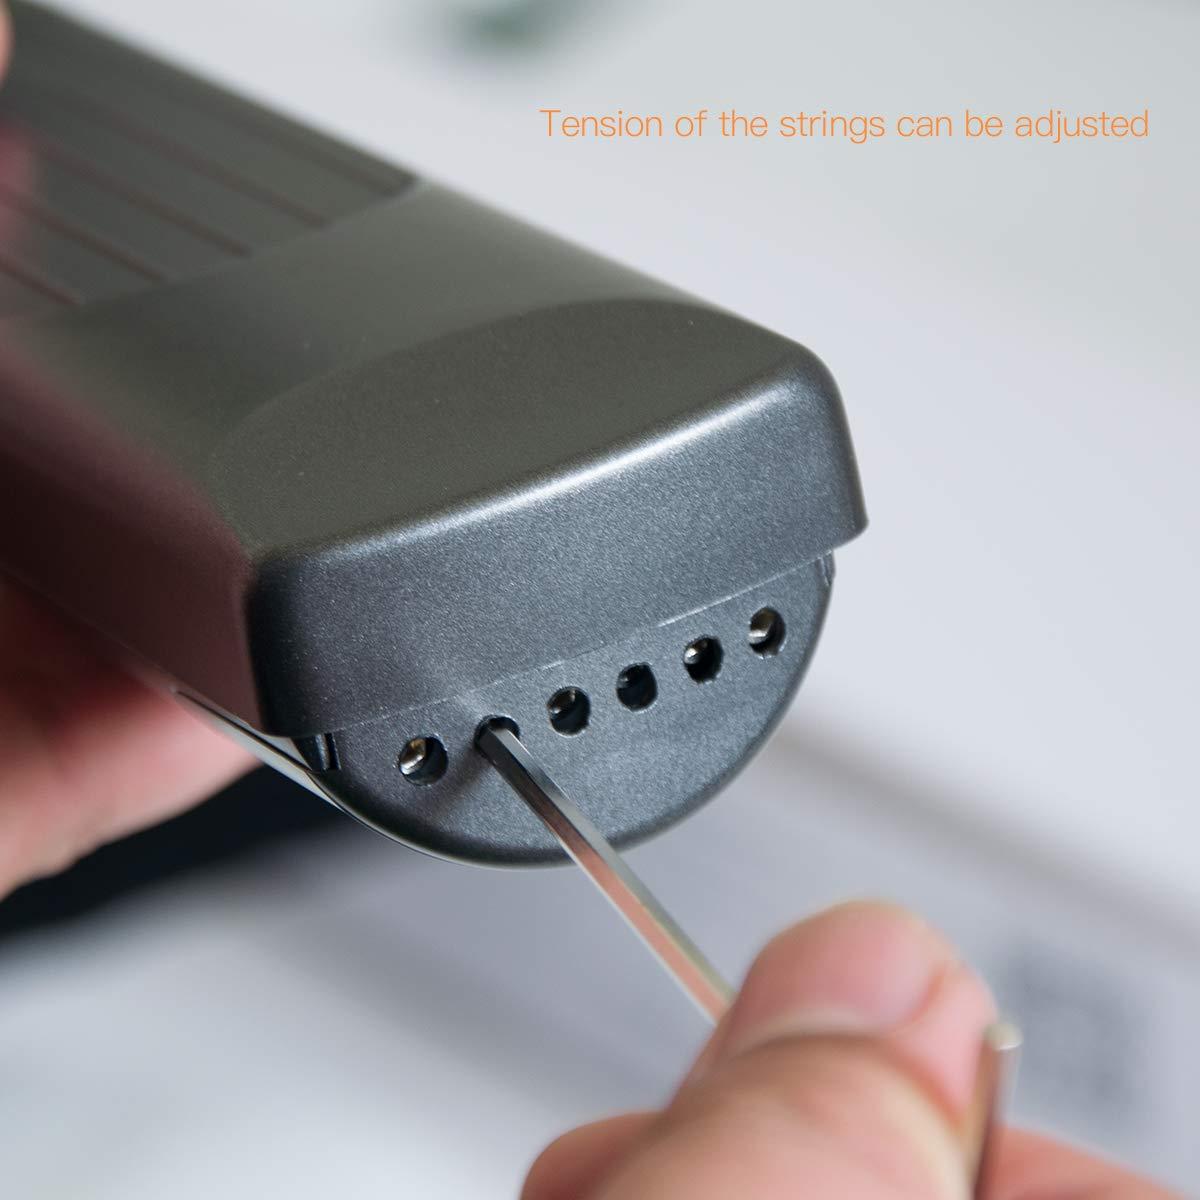 Pocket Guitar Chord Trainer principiante strumento pratico//portatile con uno schermo ruotabile Chords chart